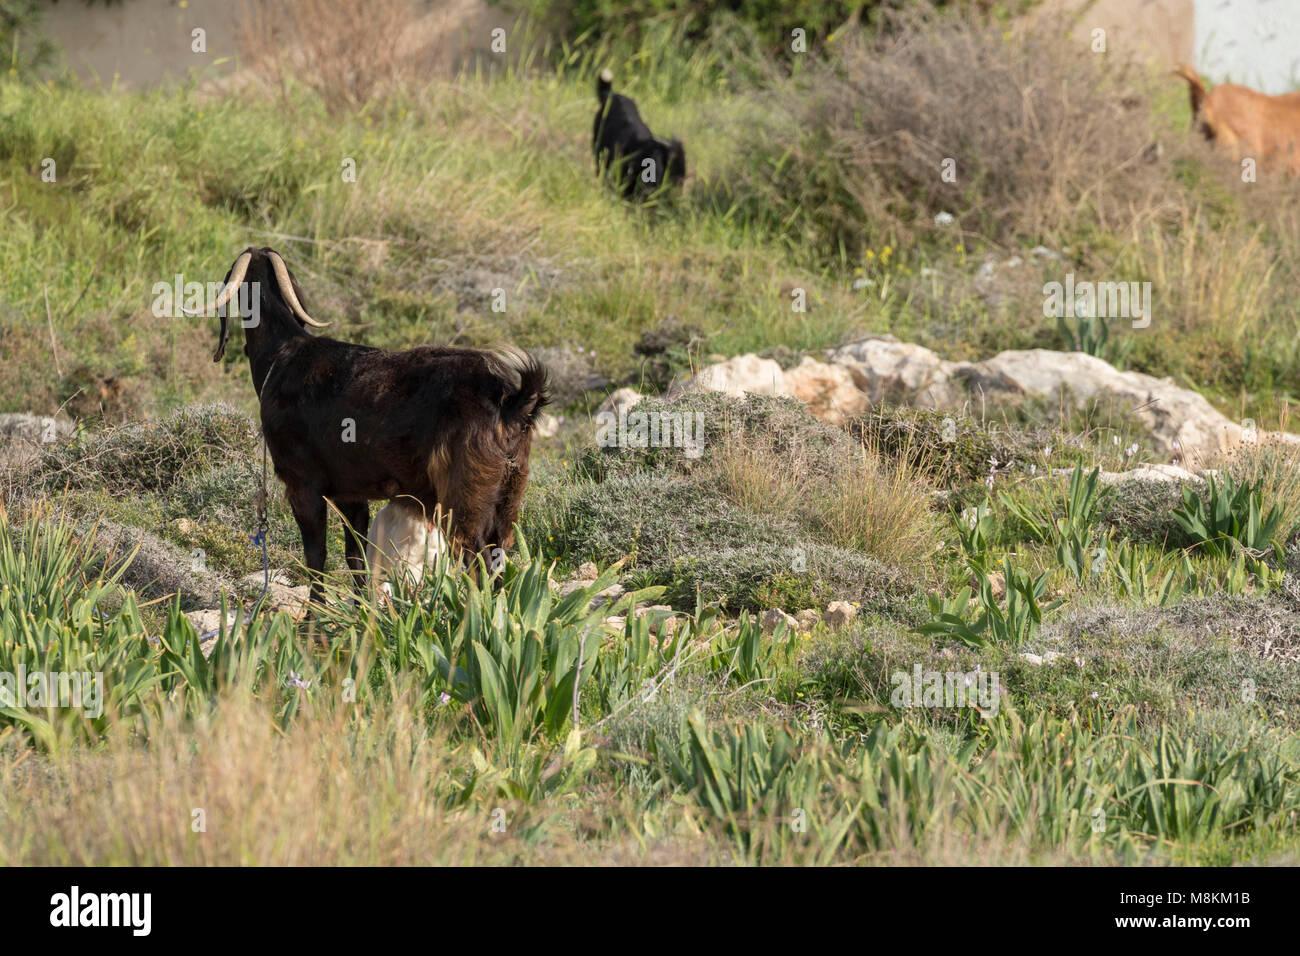 Cyprus Shami goat in vegetation in Kato-Paphos, Paphos, Cyprus, Mediterranean - Stock Image